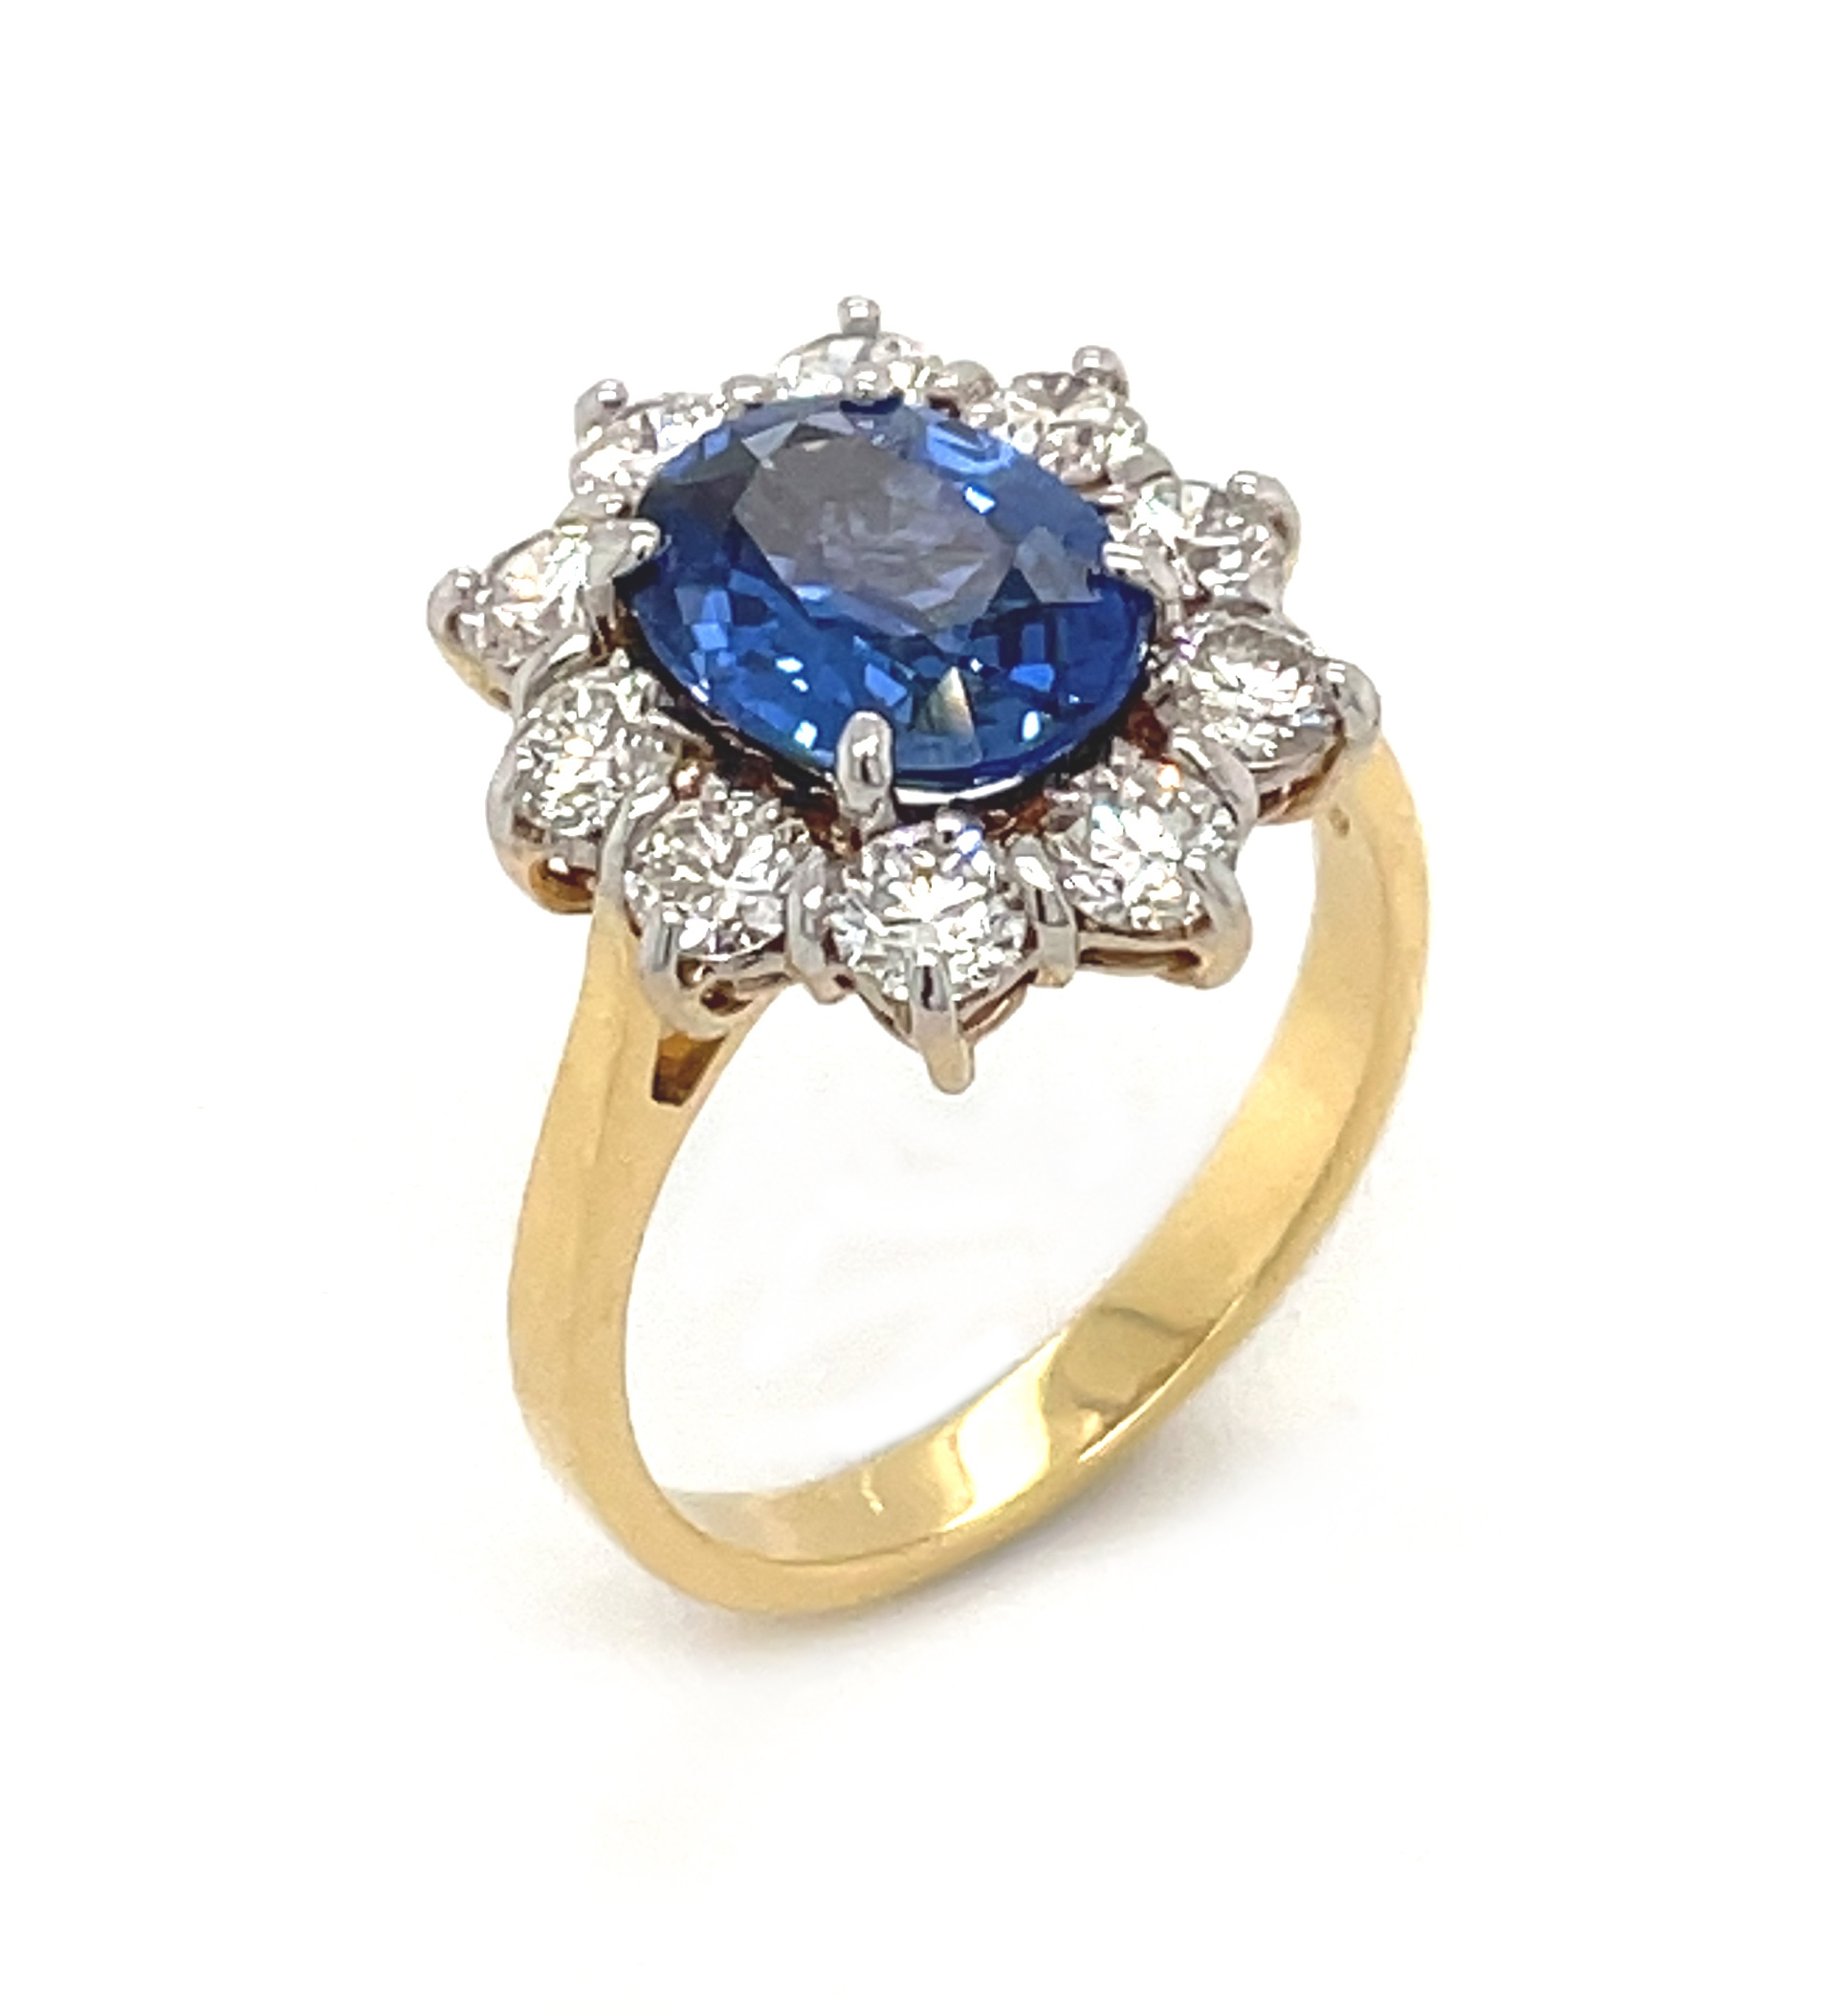 18k Yellow & White Gold Oval Sapphire & Brilliant Cut Diamond Cluster Ring